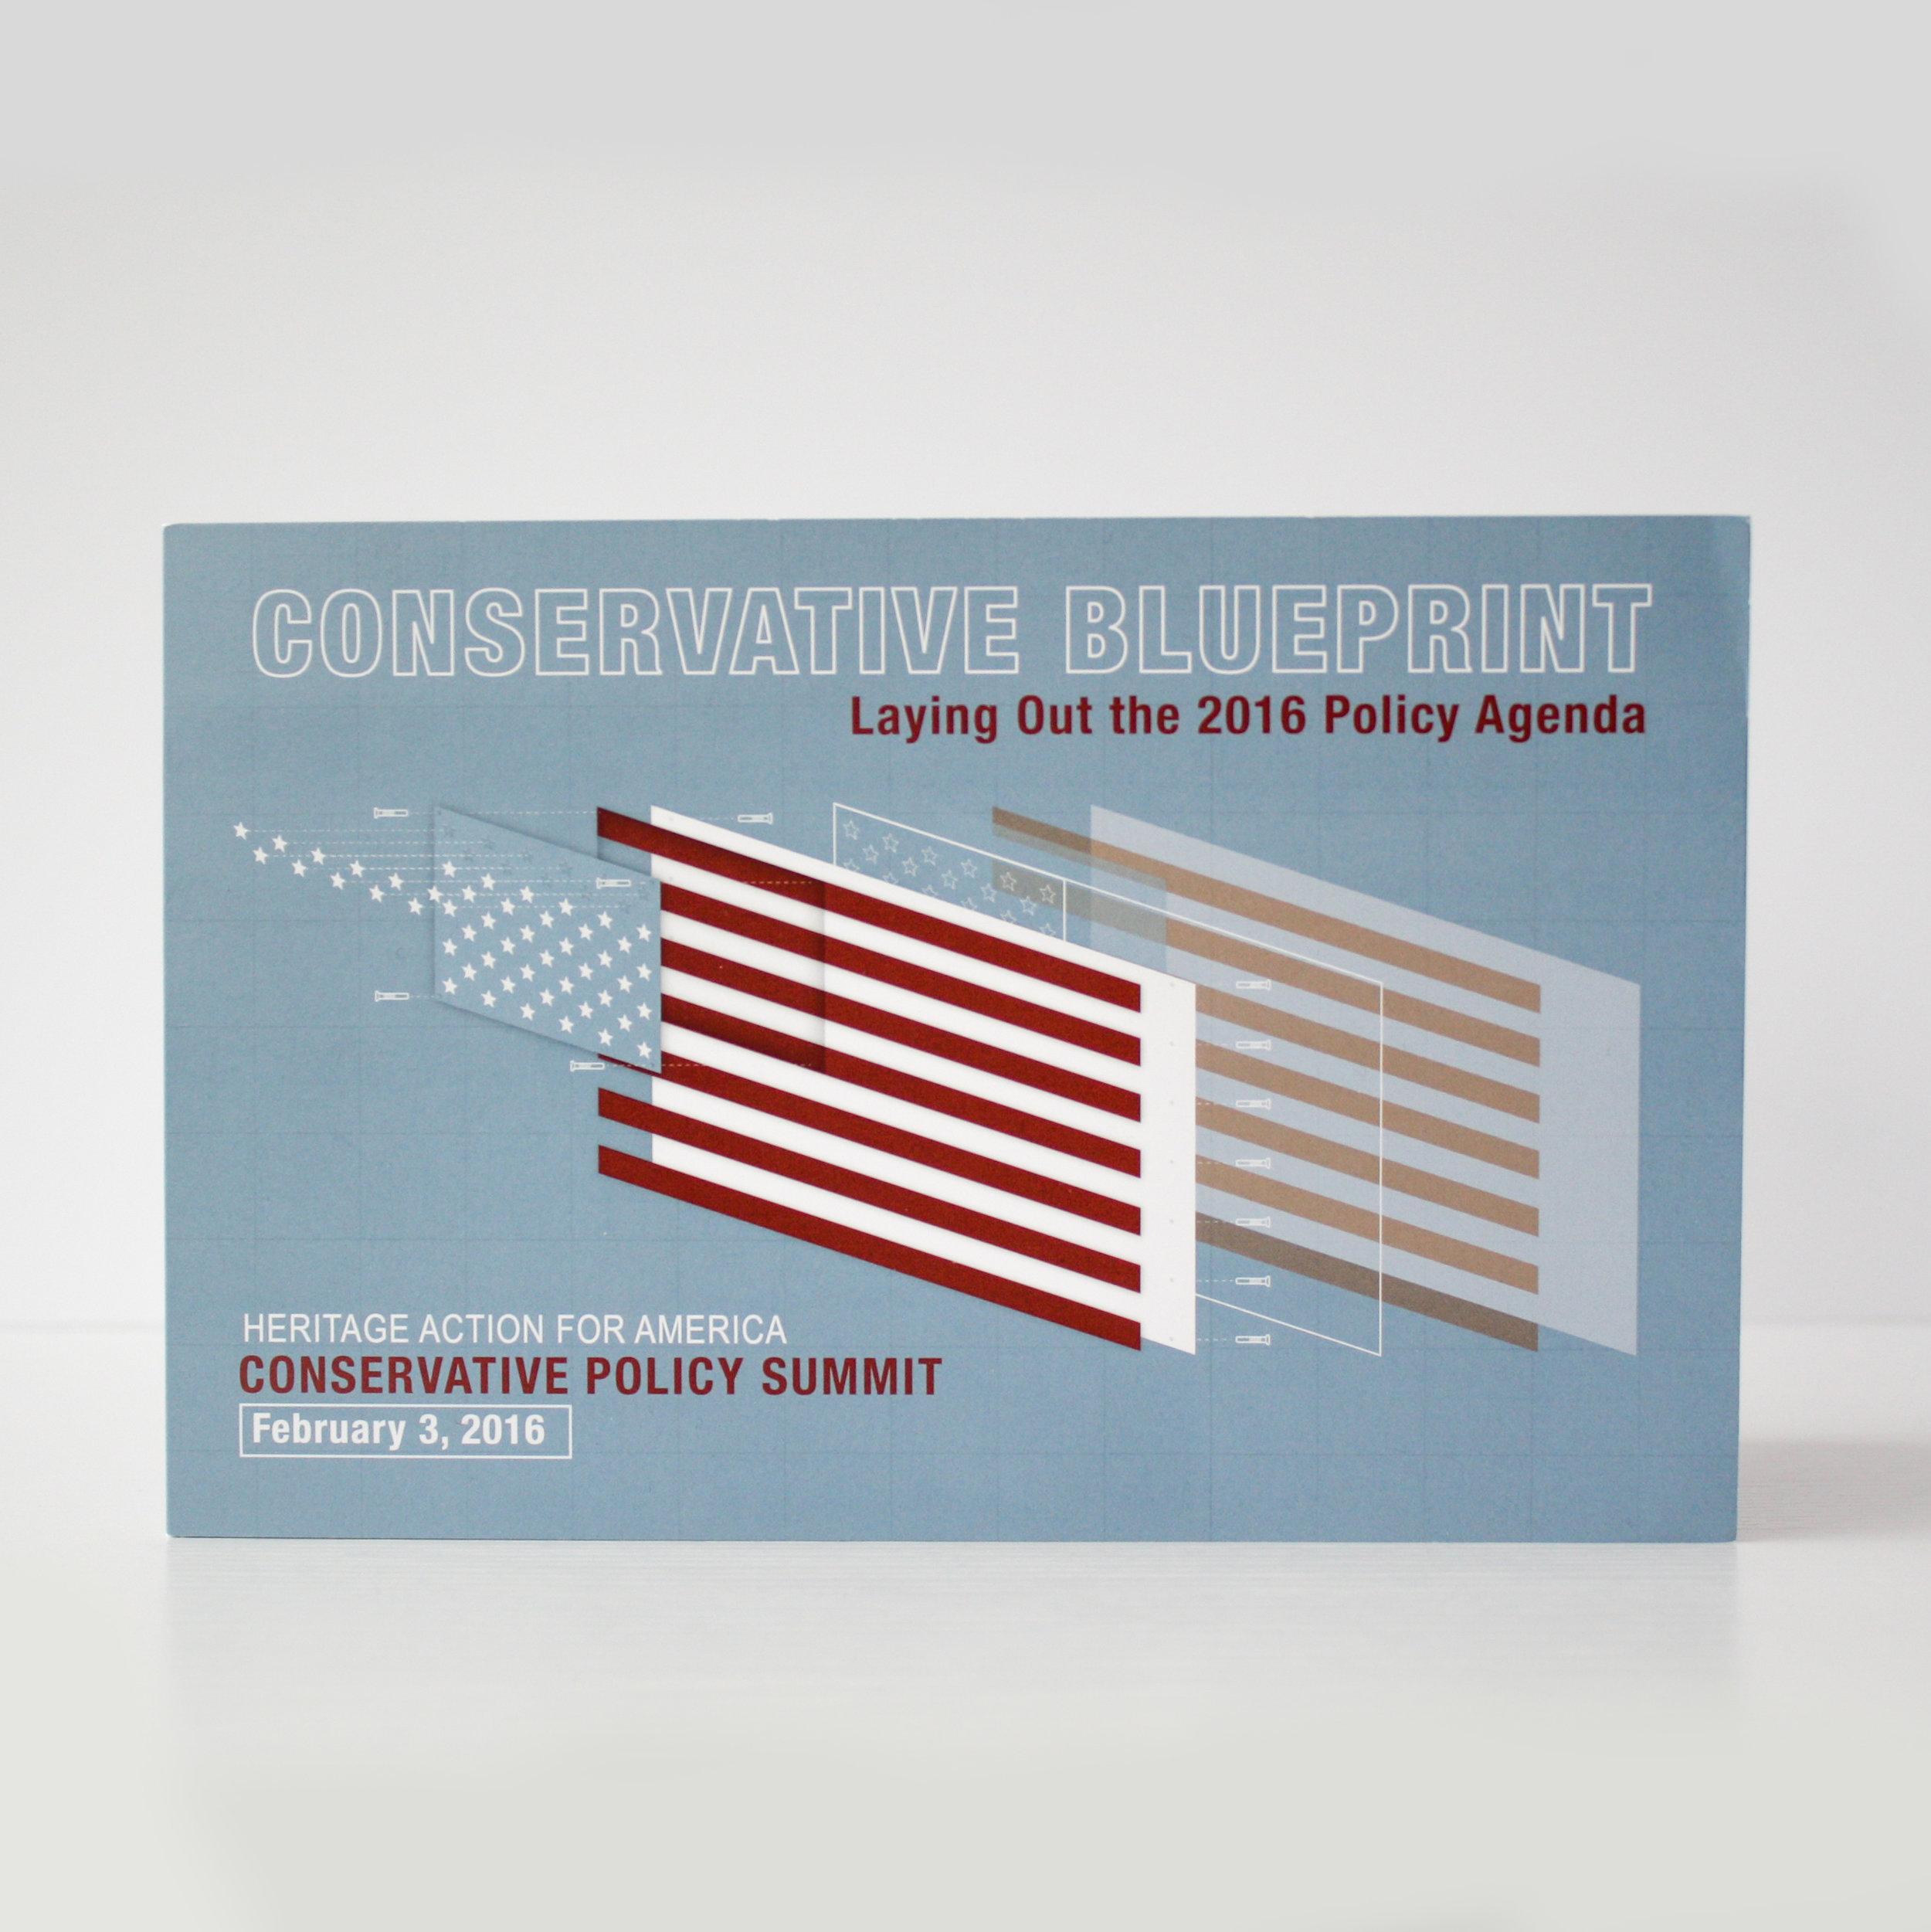 Conservative Policy Summit Corporate Event Invitation | Casi Long Design | casilong.com:portfolio | #casilongdesign #fearlesspursuit Thumbnail.jpg